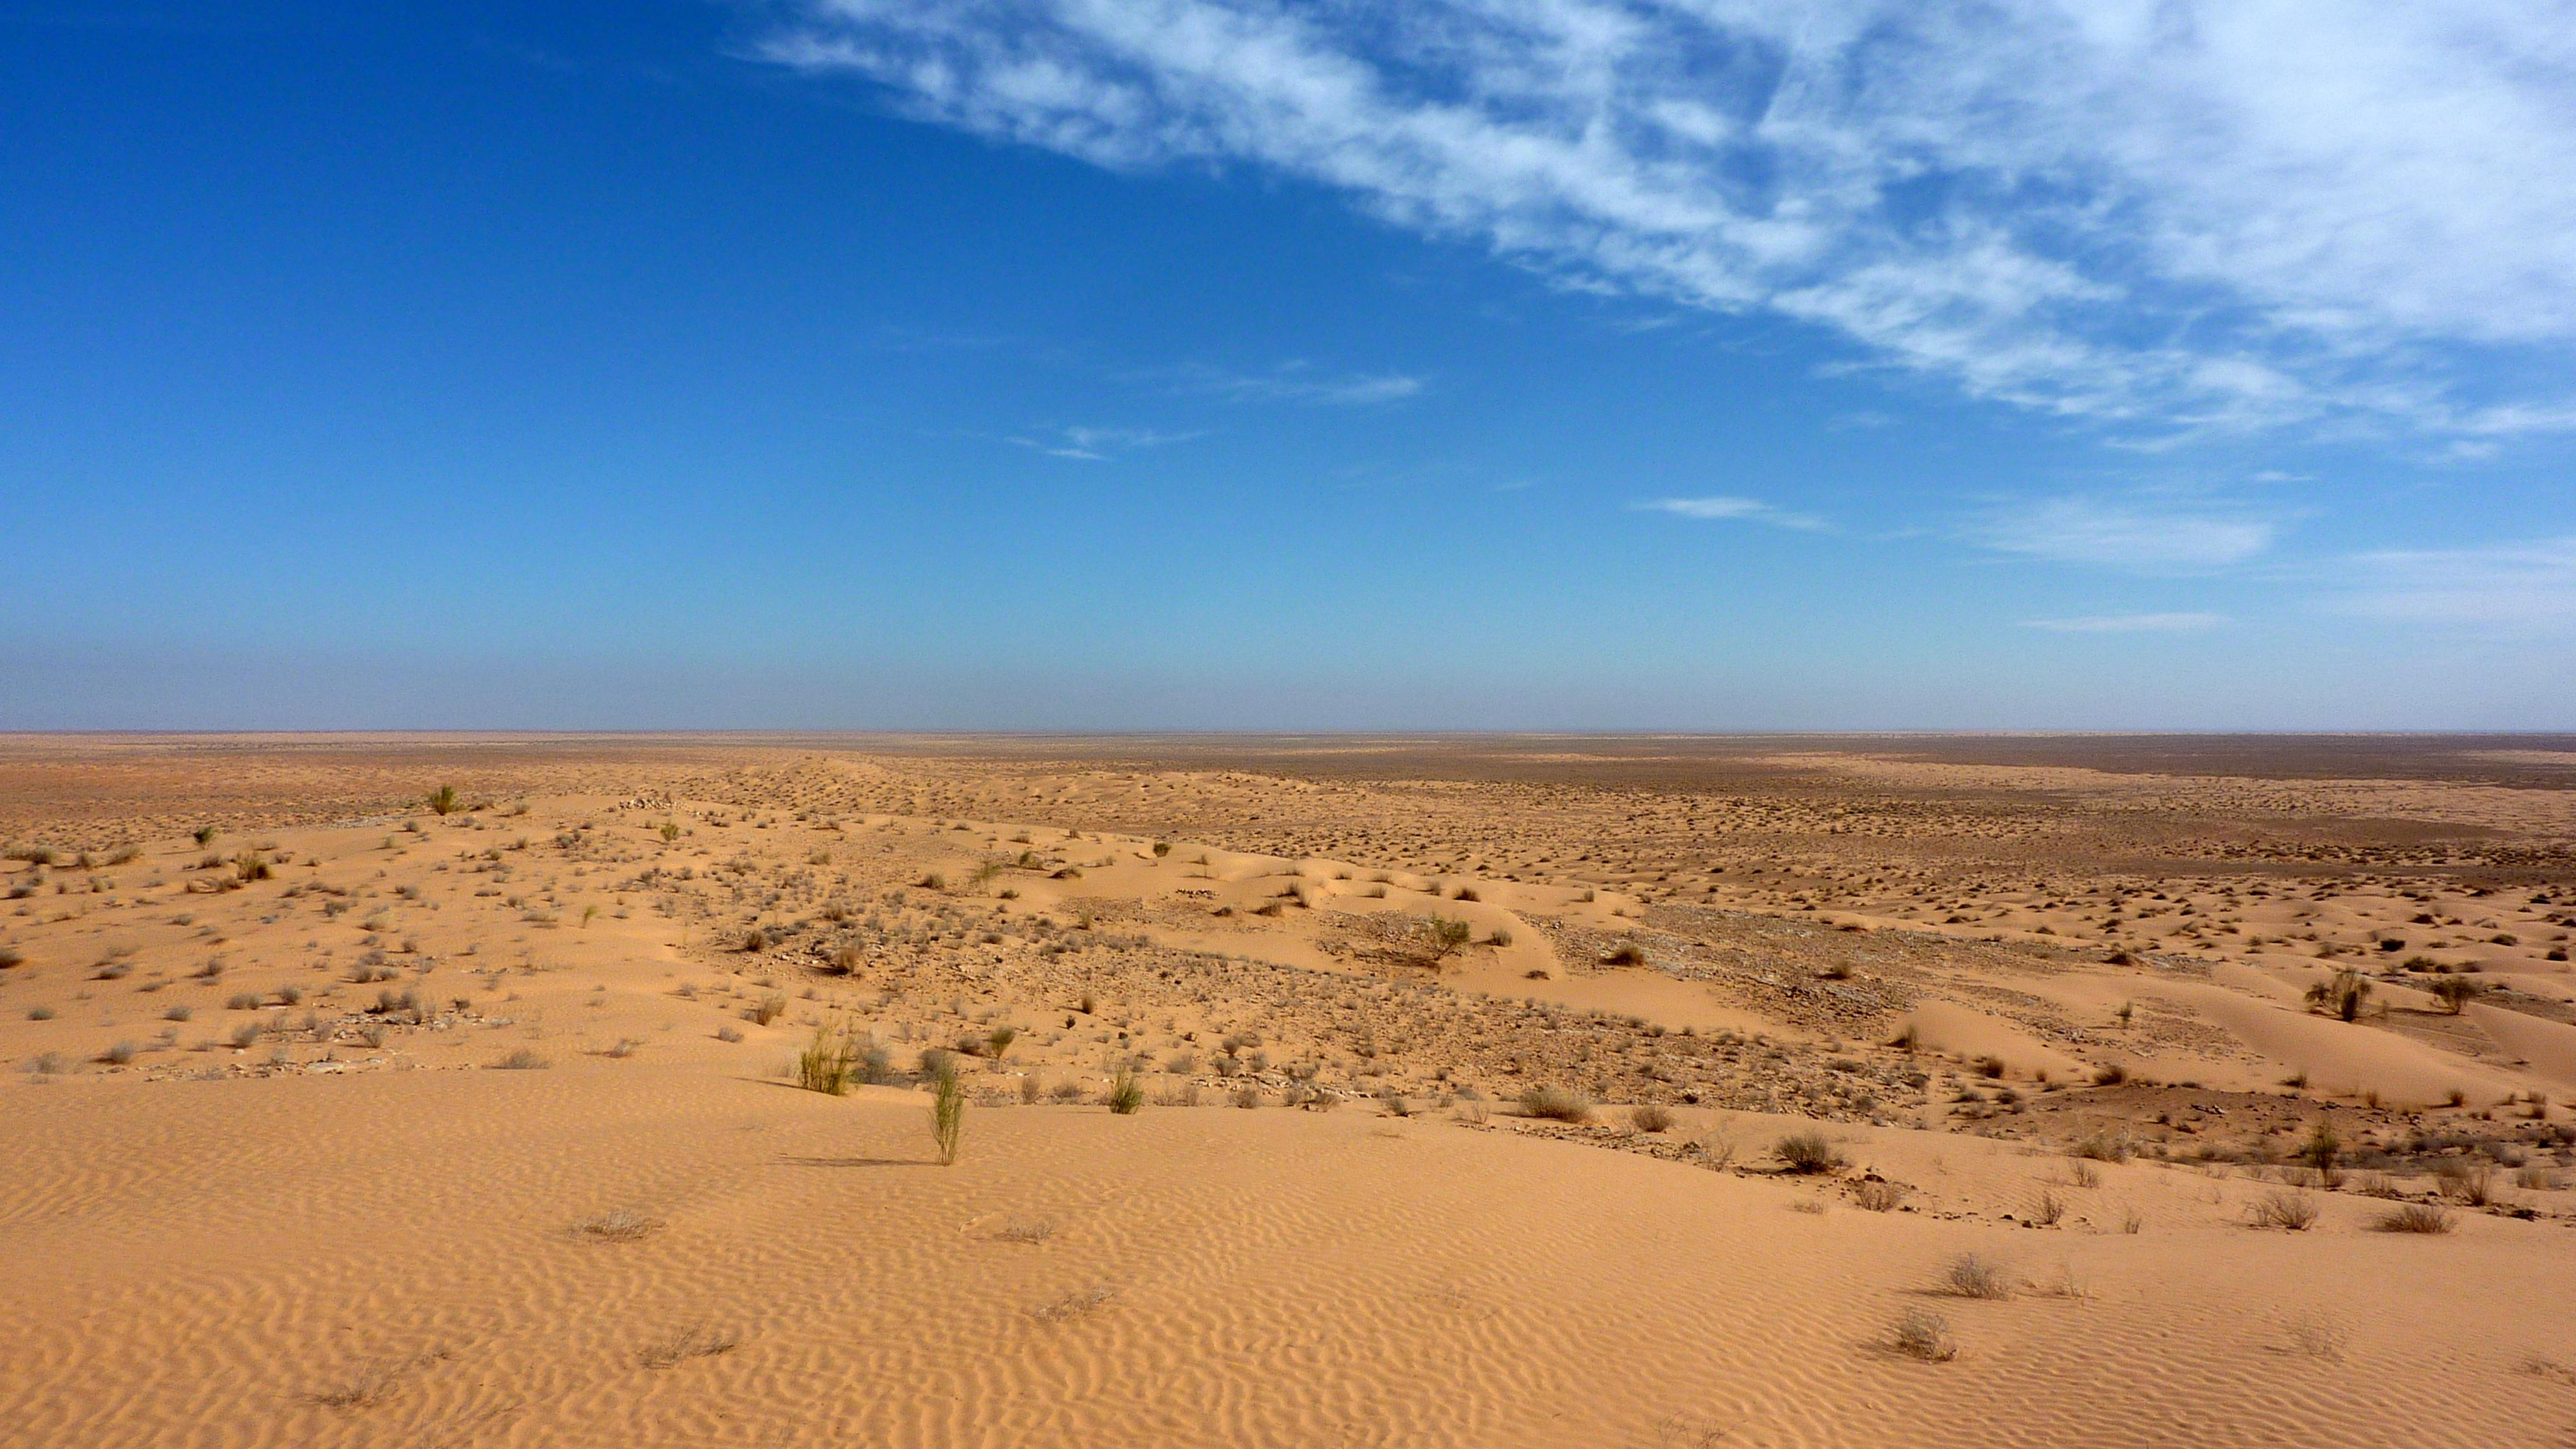 File:Sahara 1.jpg - Wikimedia Commons